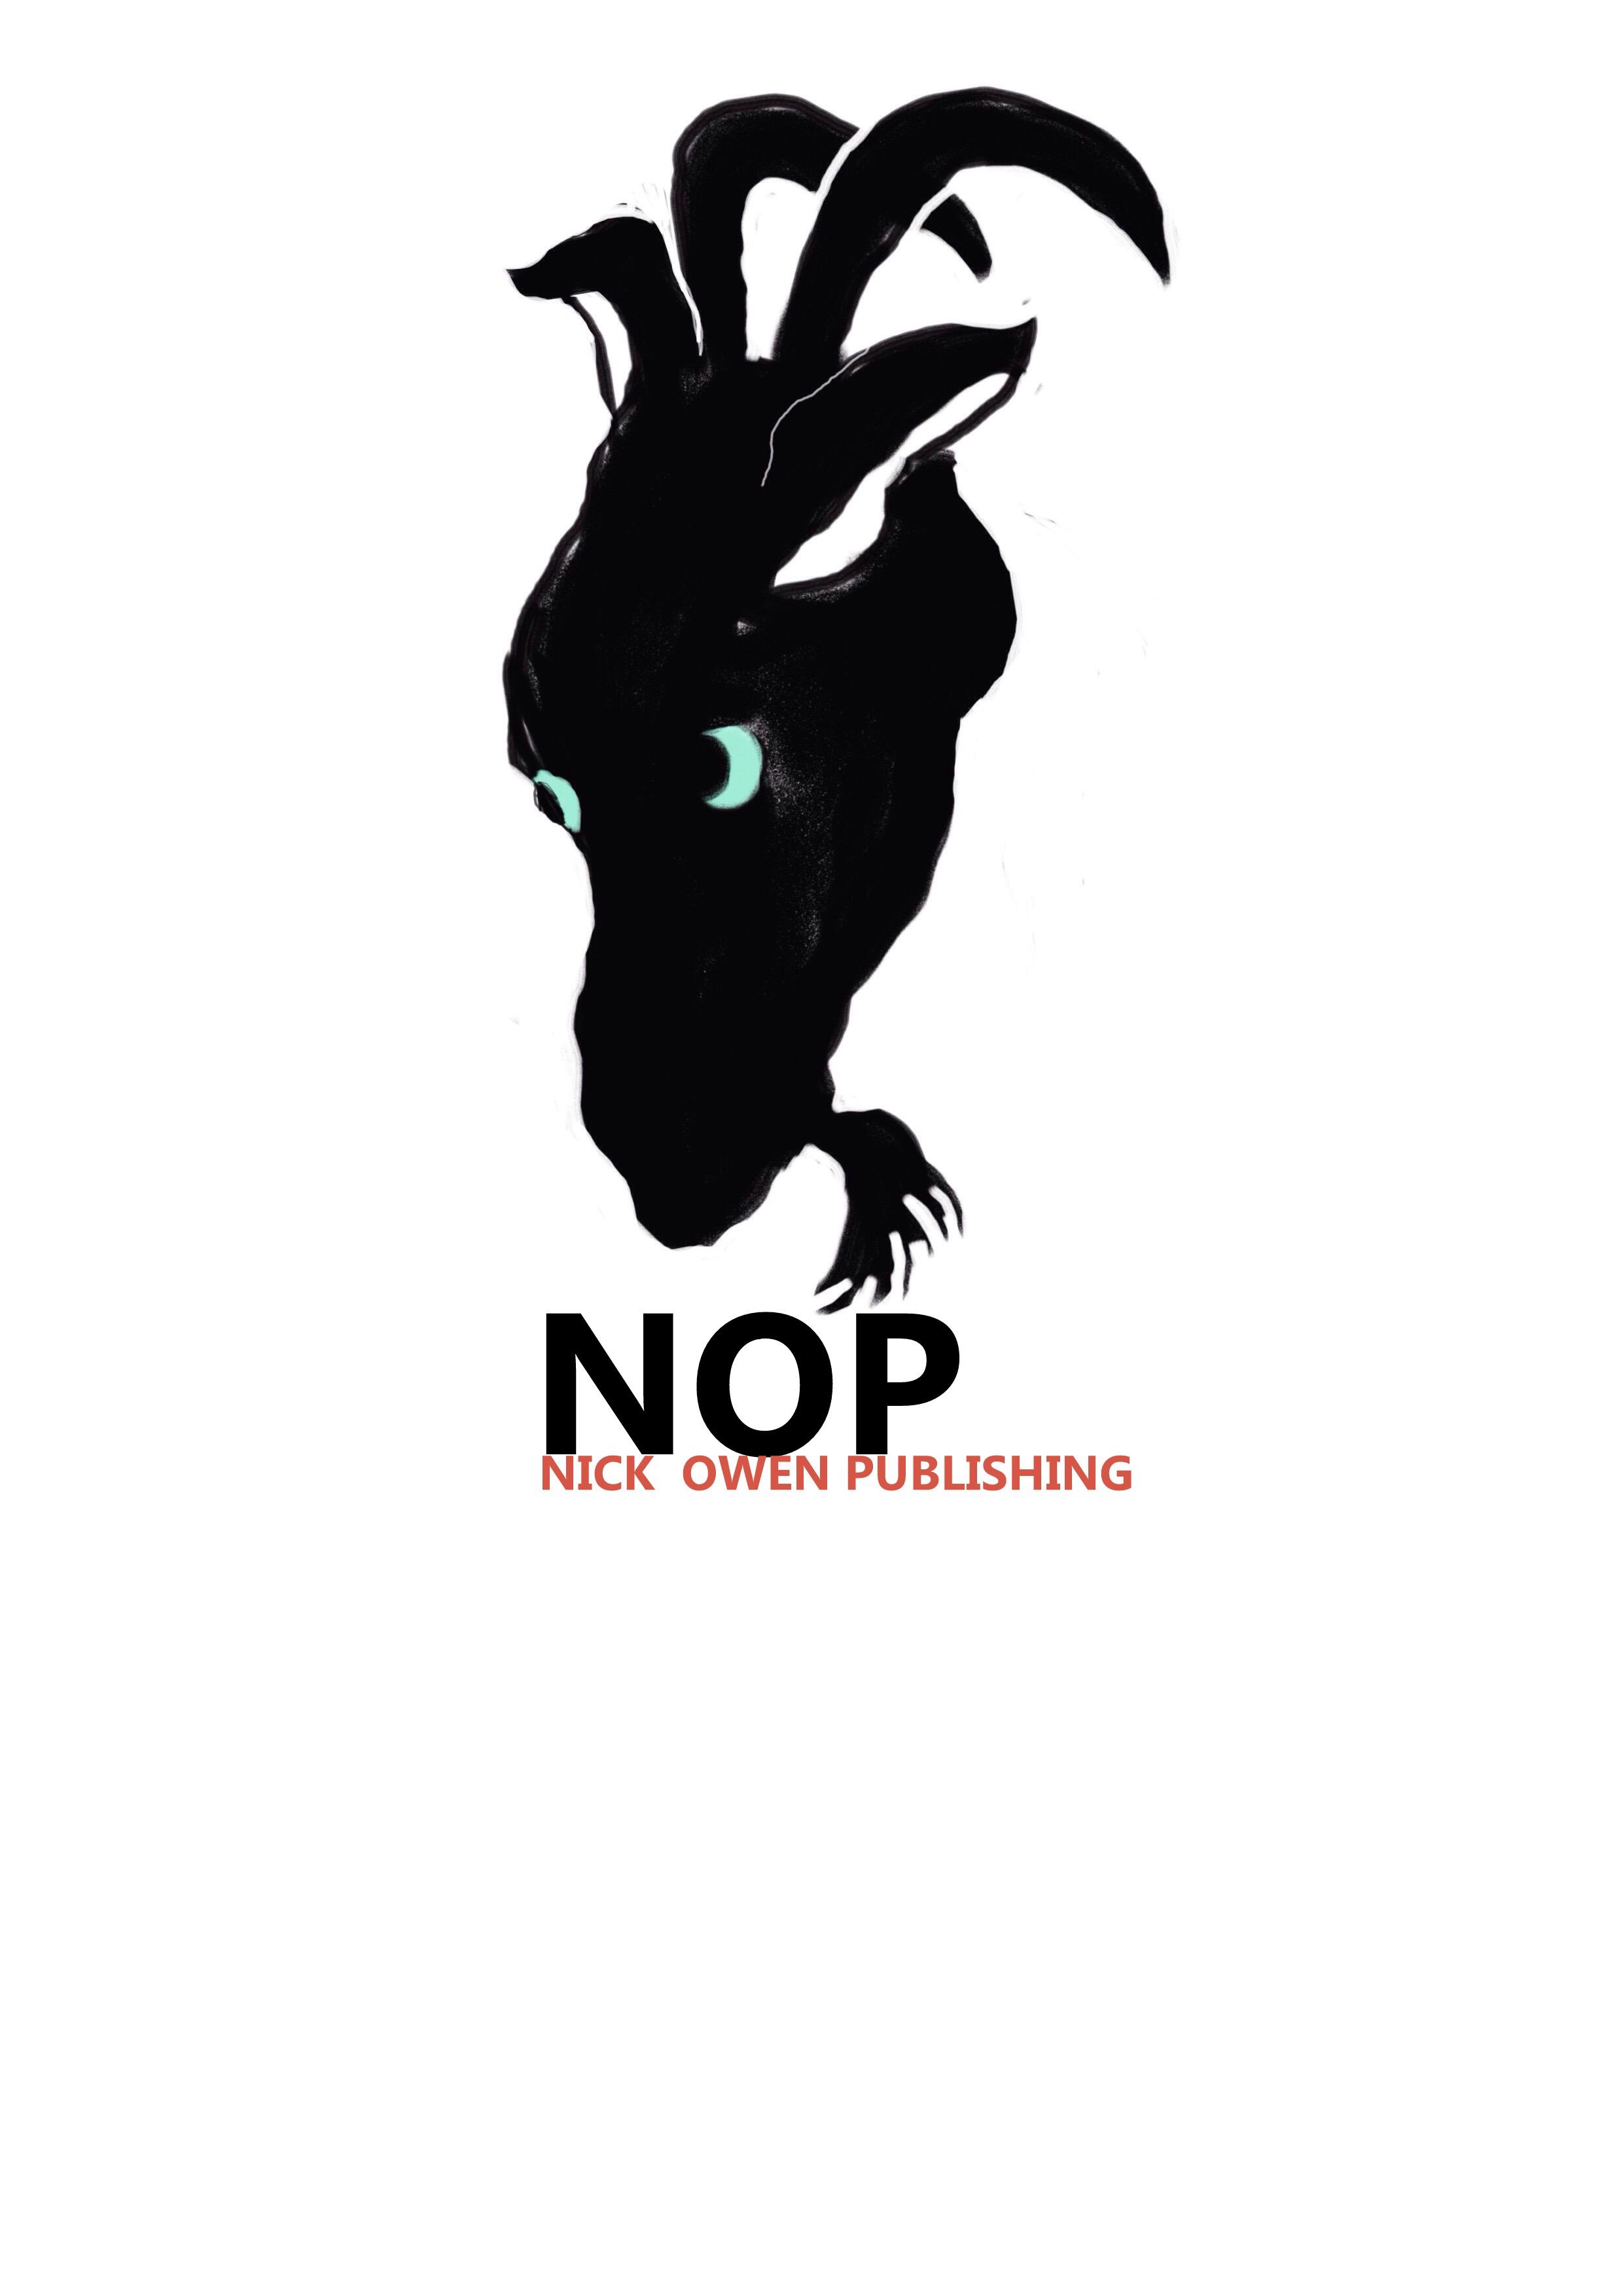 The logo of Nick Owen Publishing Ltd.